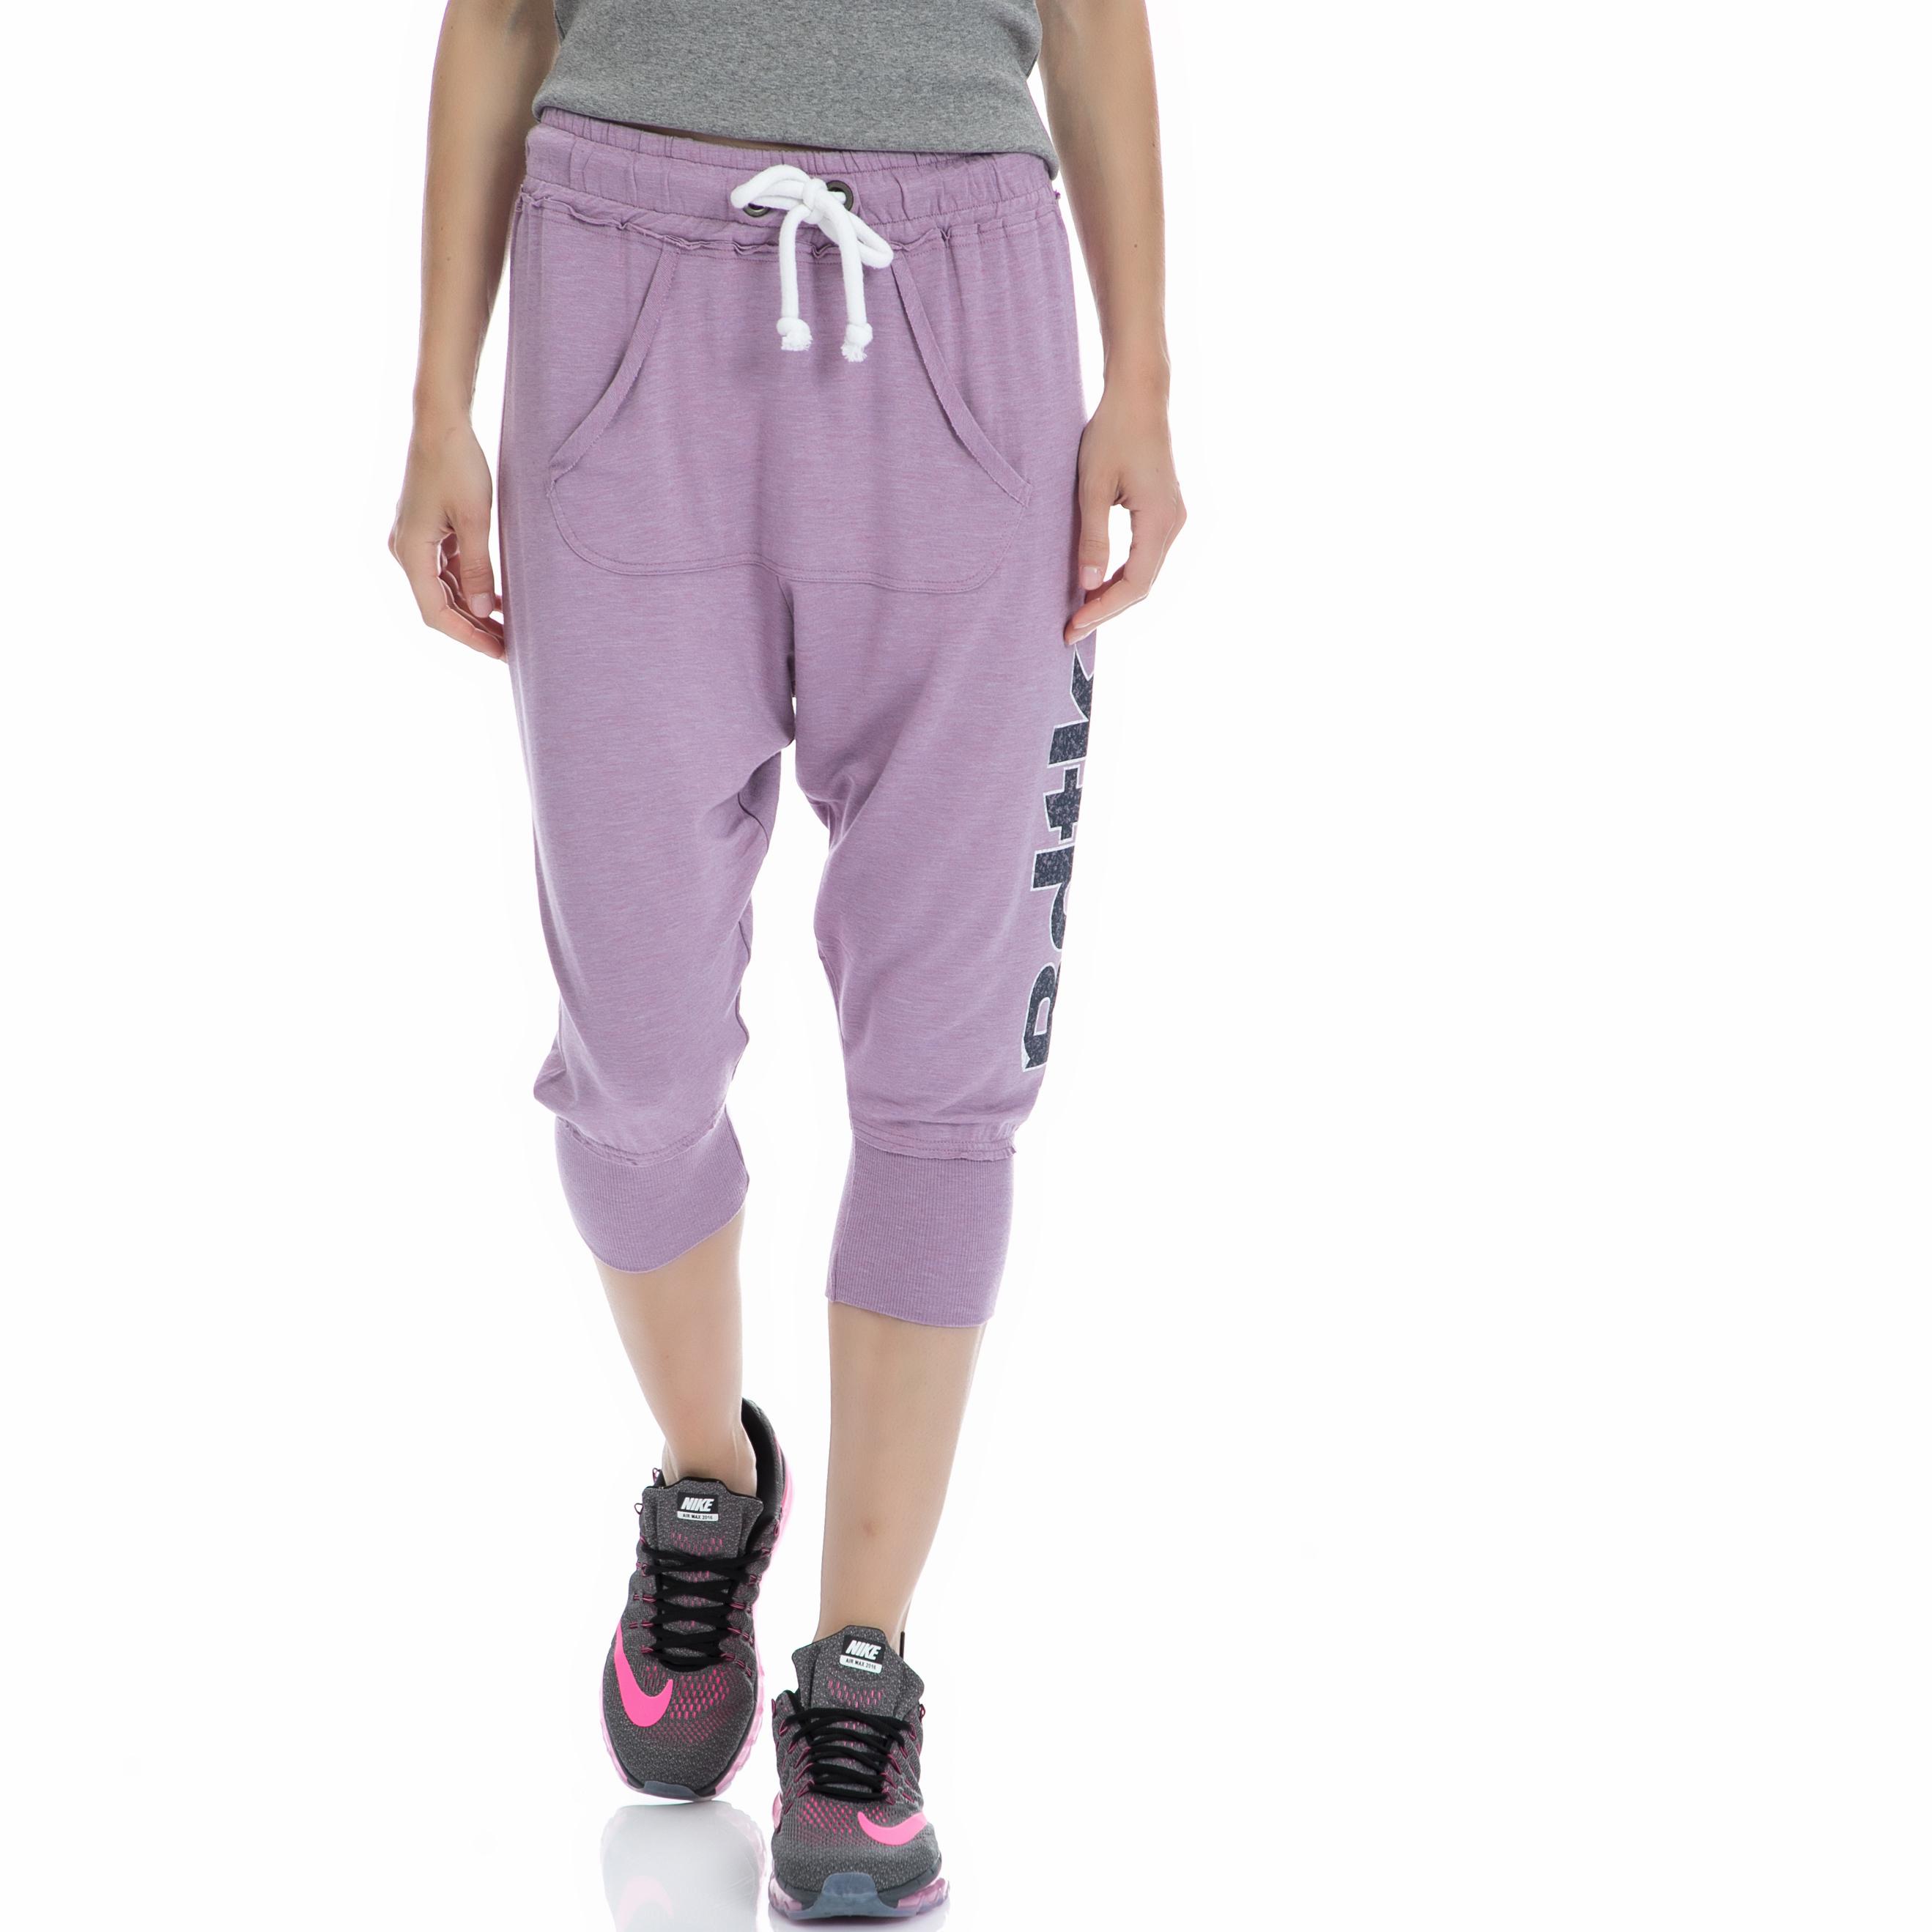 BODYTALK - Γυναικεία φόρμα BODYTALK μοβ γυναικεία ρούχα αθλητικά φόρμες